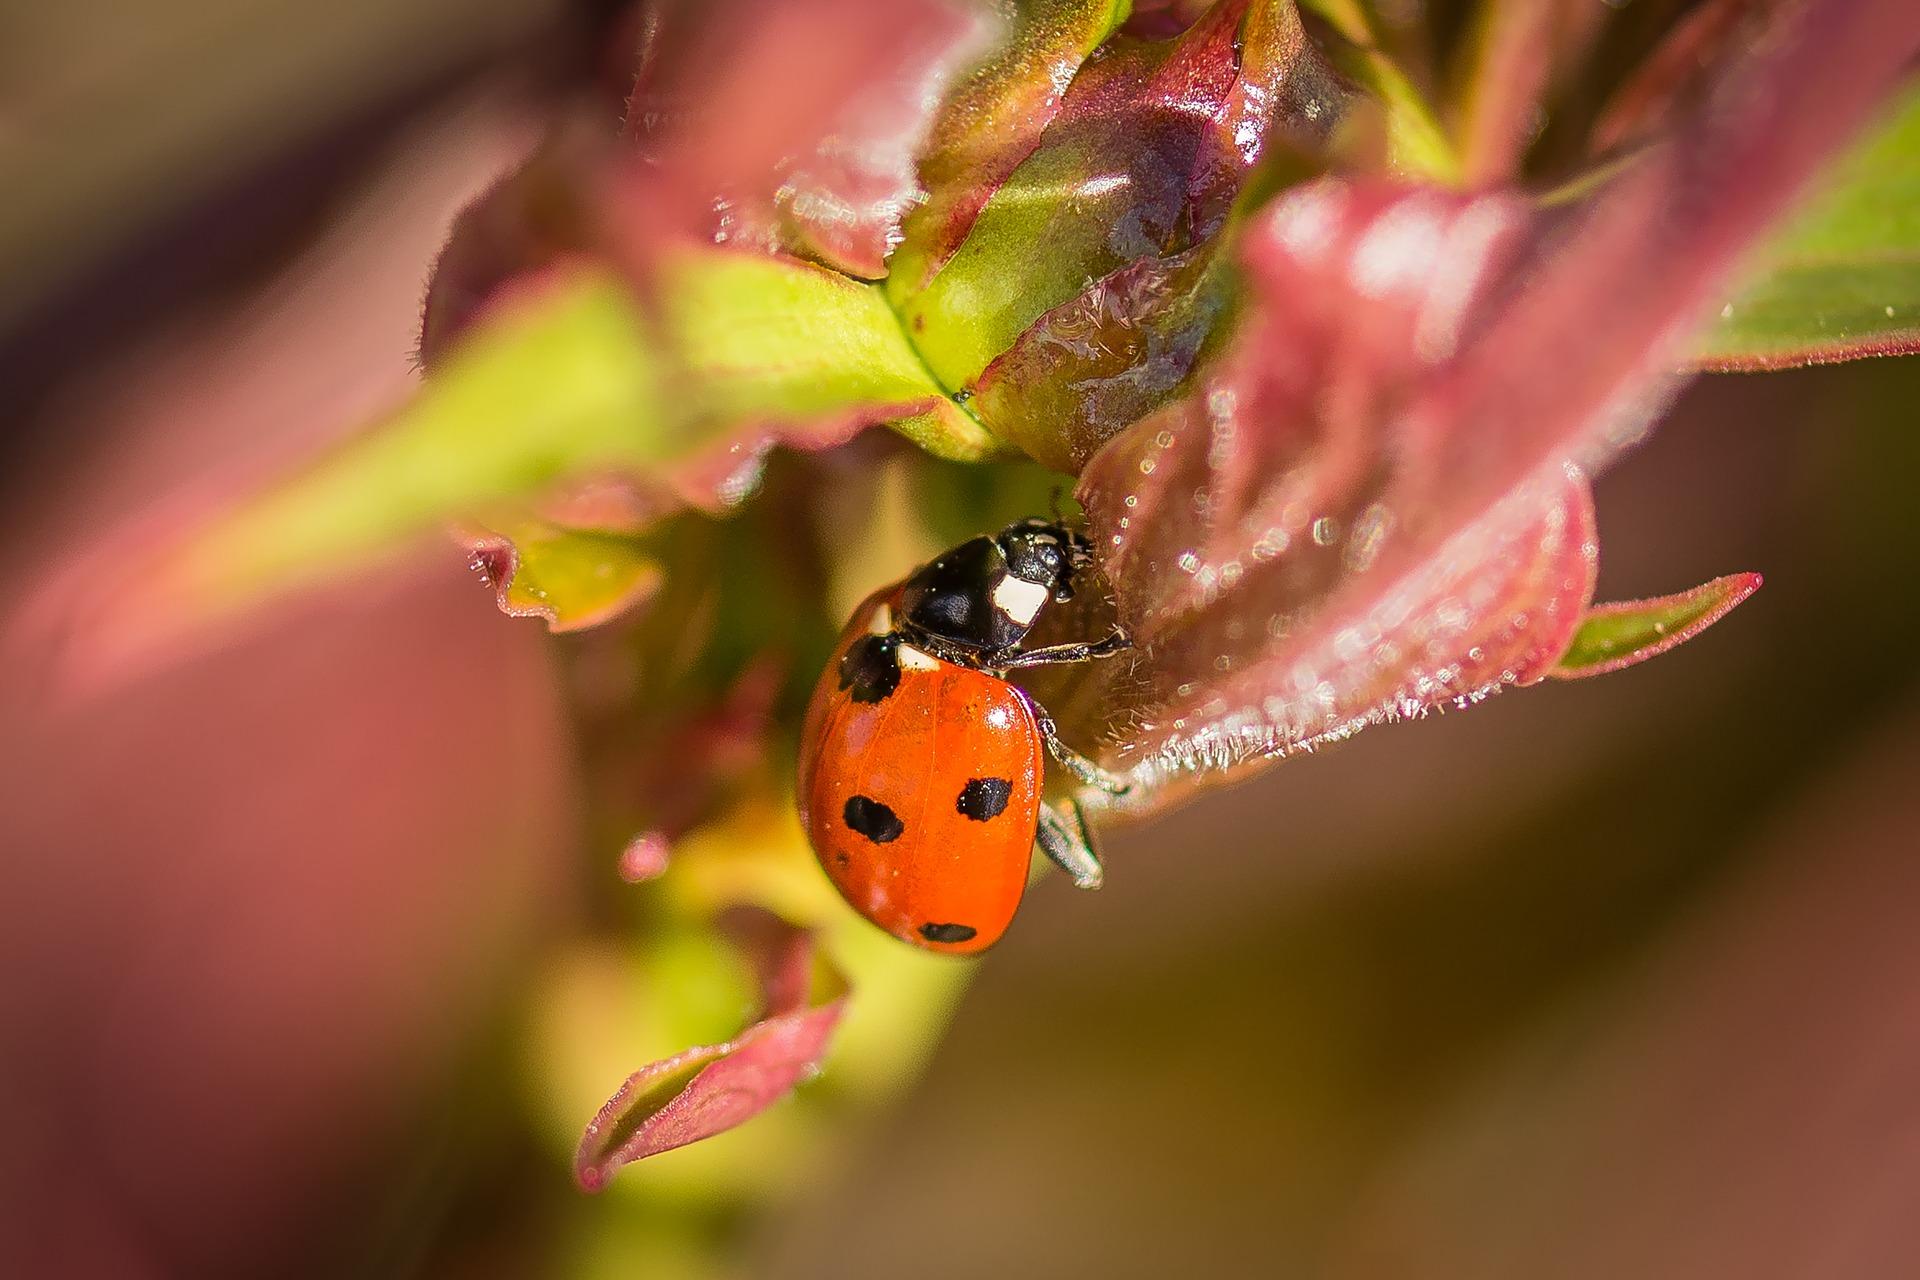 ladybug-2237192_1920